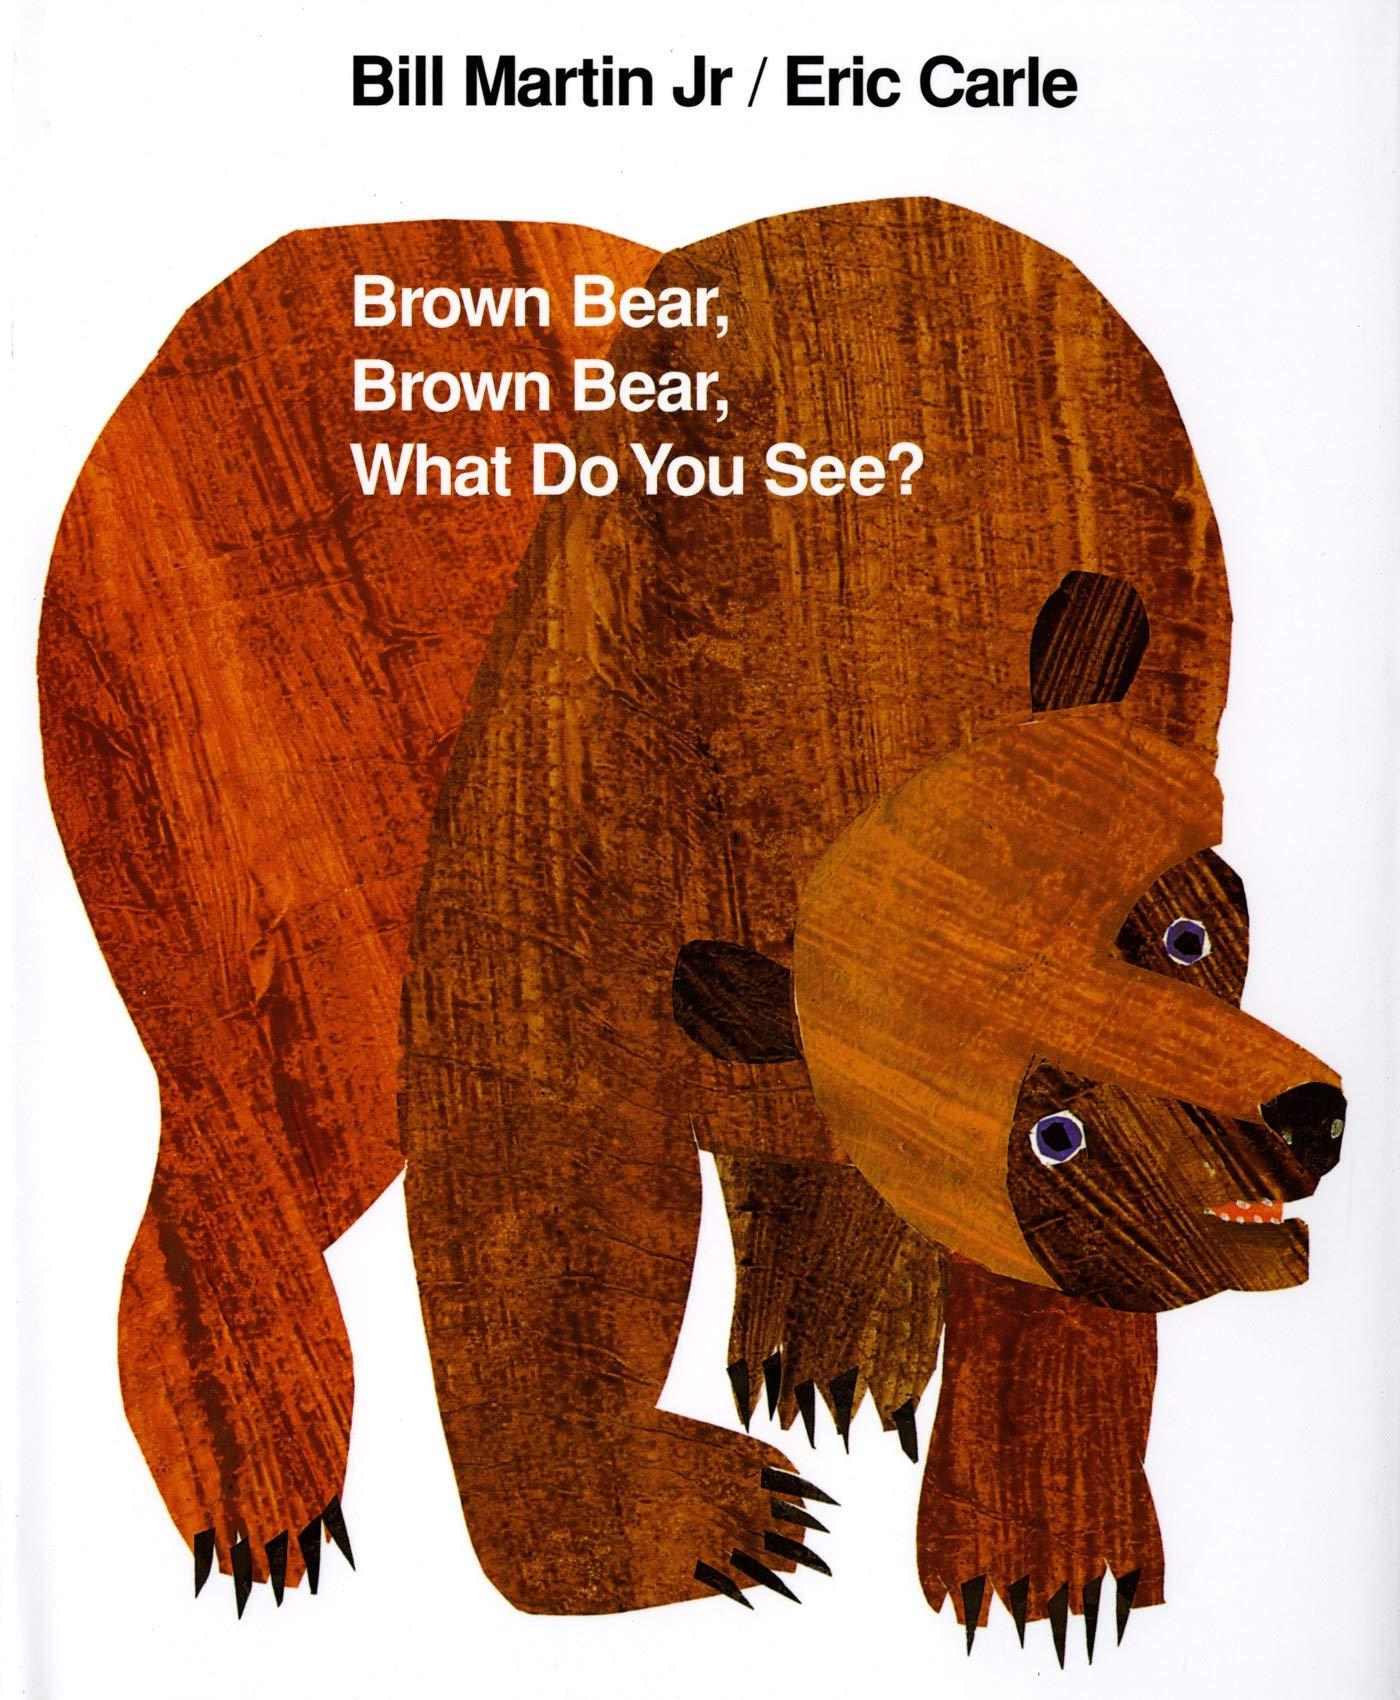 Amazon.com: Brown Bear, Brown Bear, What Do You See? (9780805017441):  Martin Jr., Bill, Carle, Eric: Books